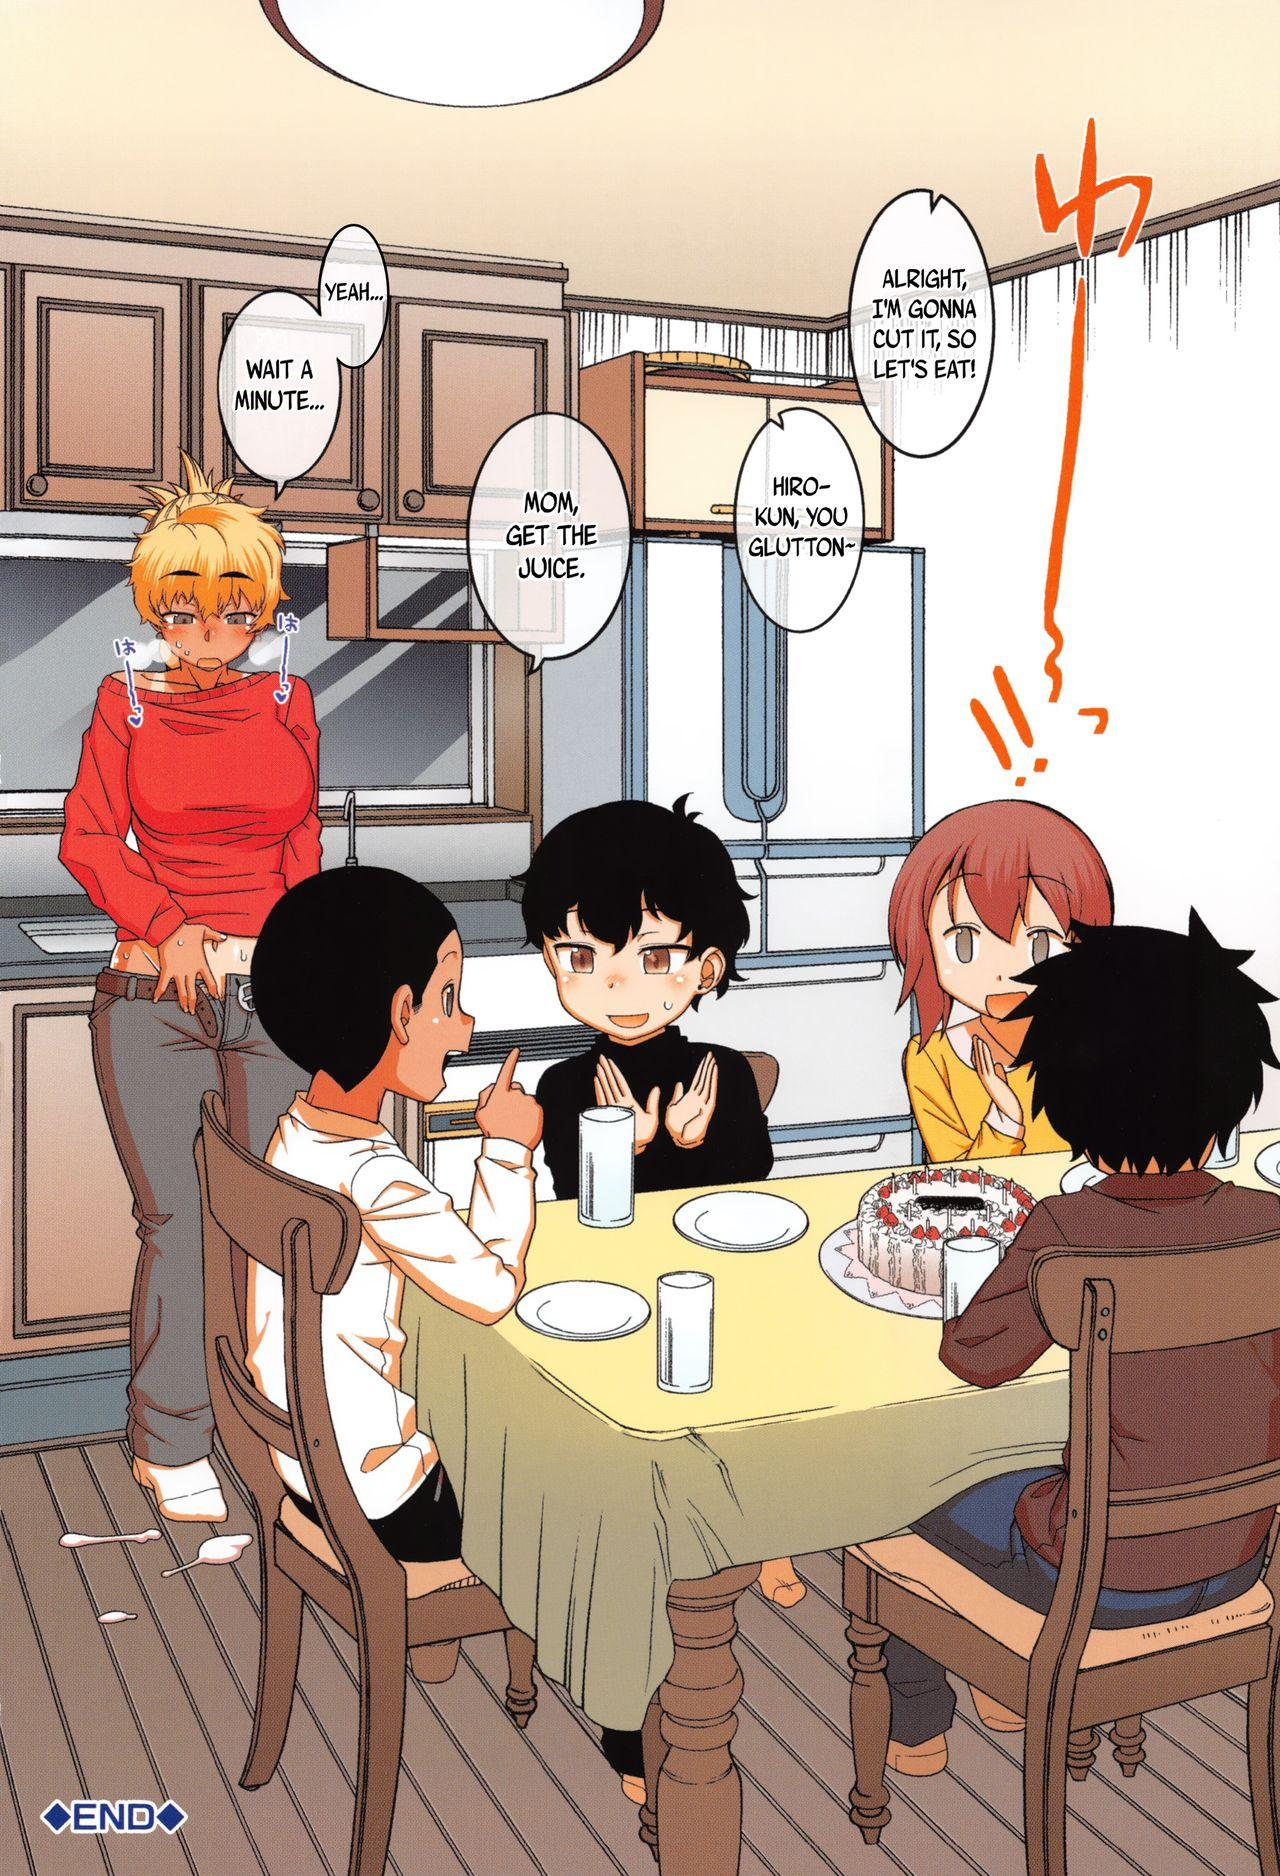 [Takatsu] Hitozuma A-san to Musuko no Yuujin N-kun - Married wife A and son's friend N-kun Ch. 1-3 [English] 7